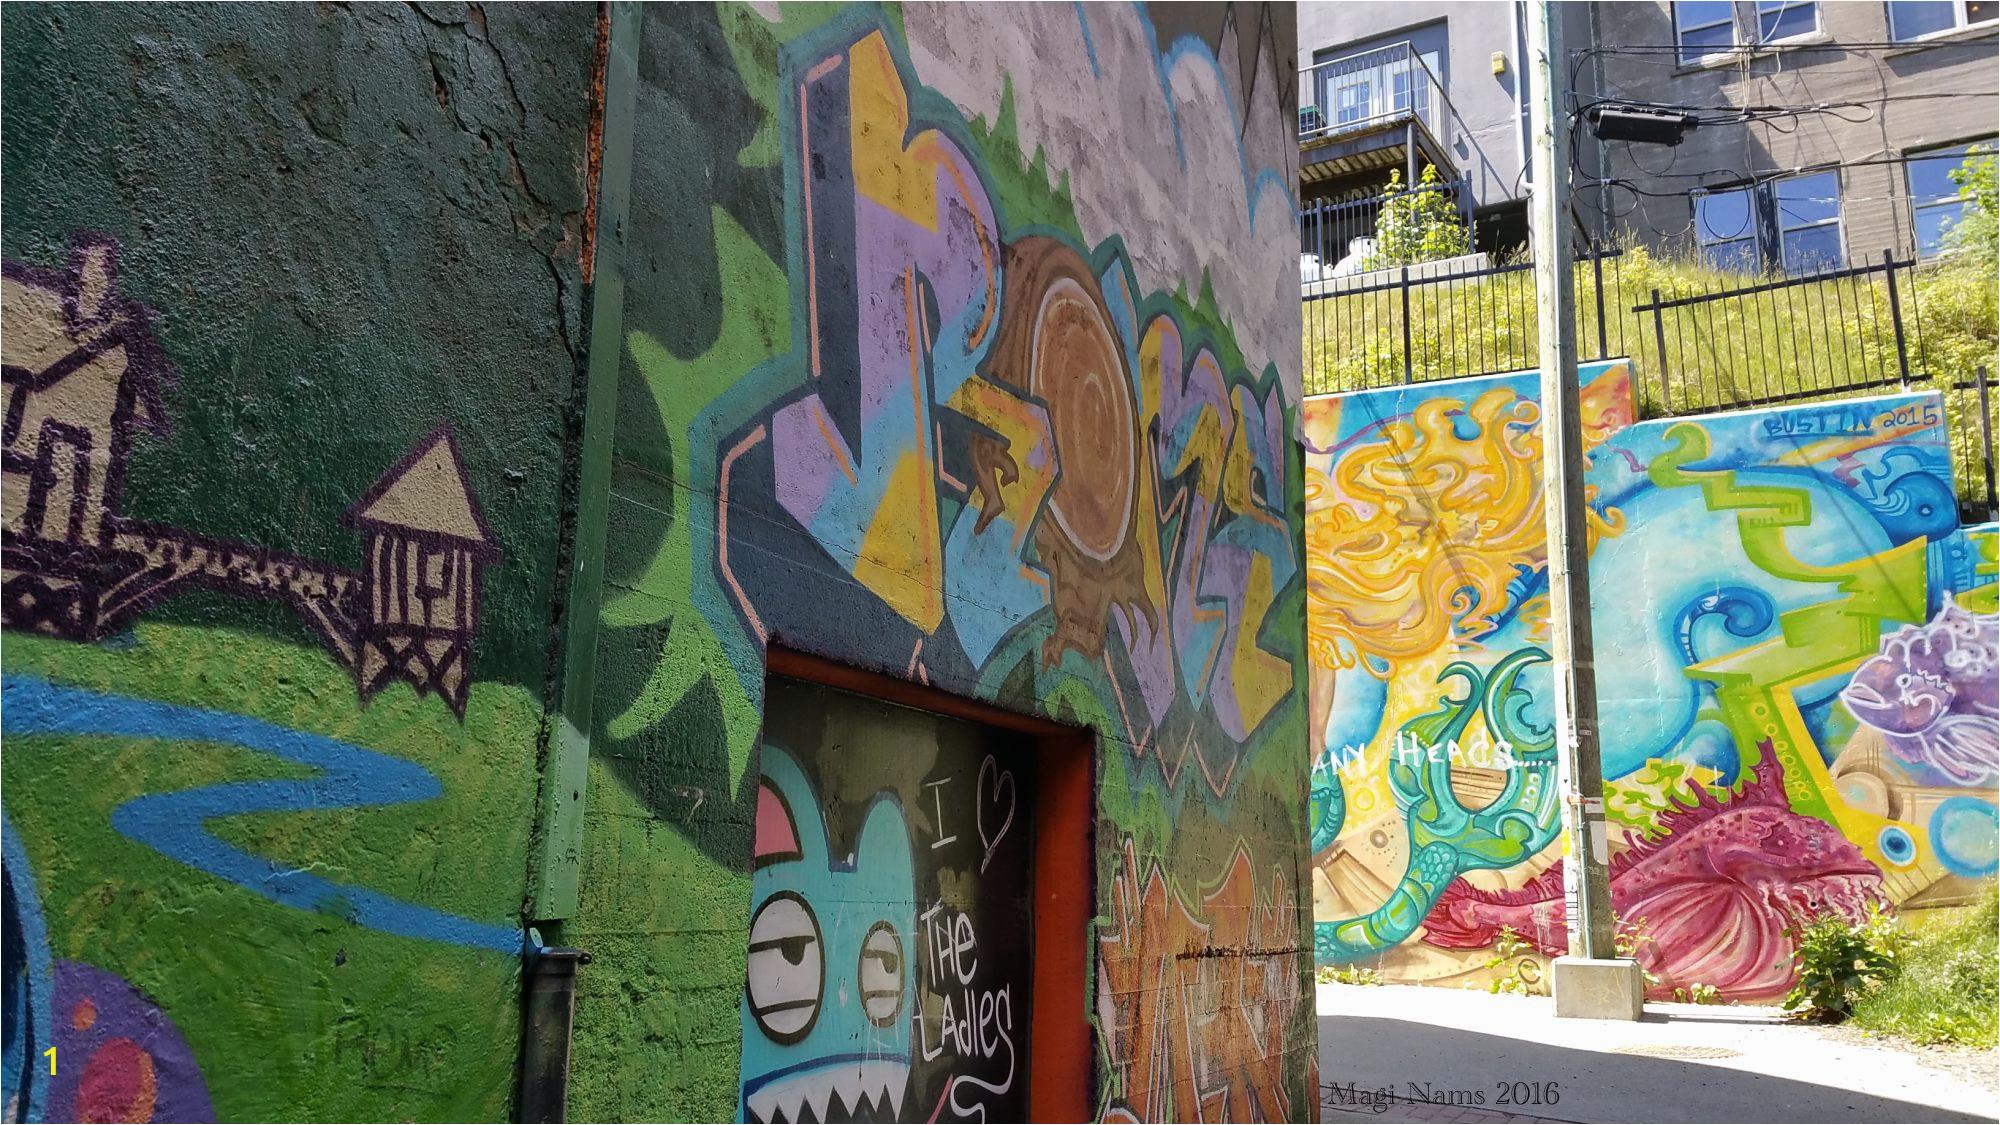 2016 07 08 St John grafitti C